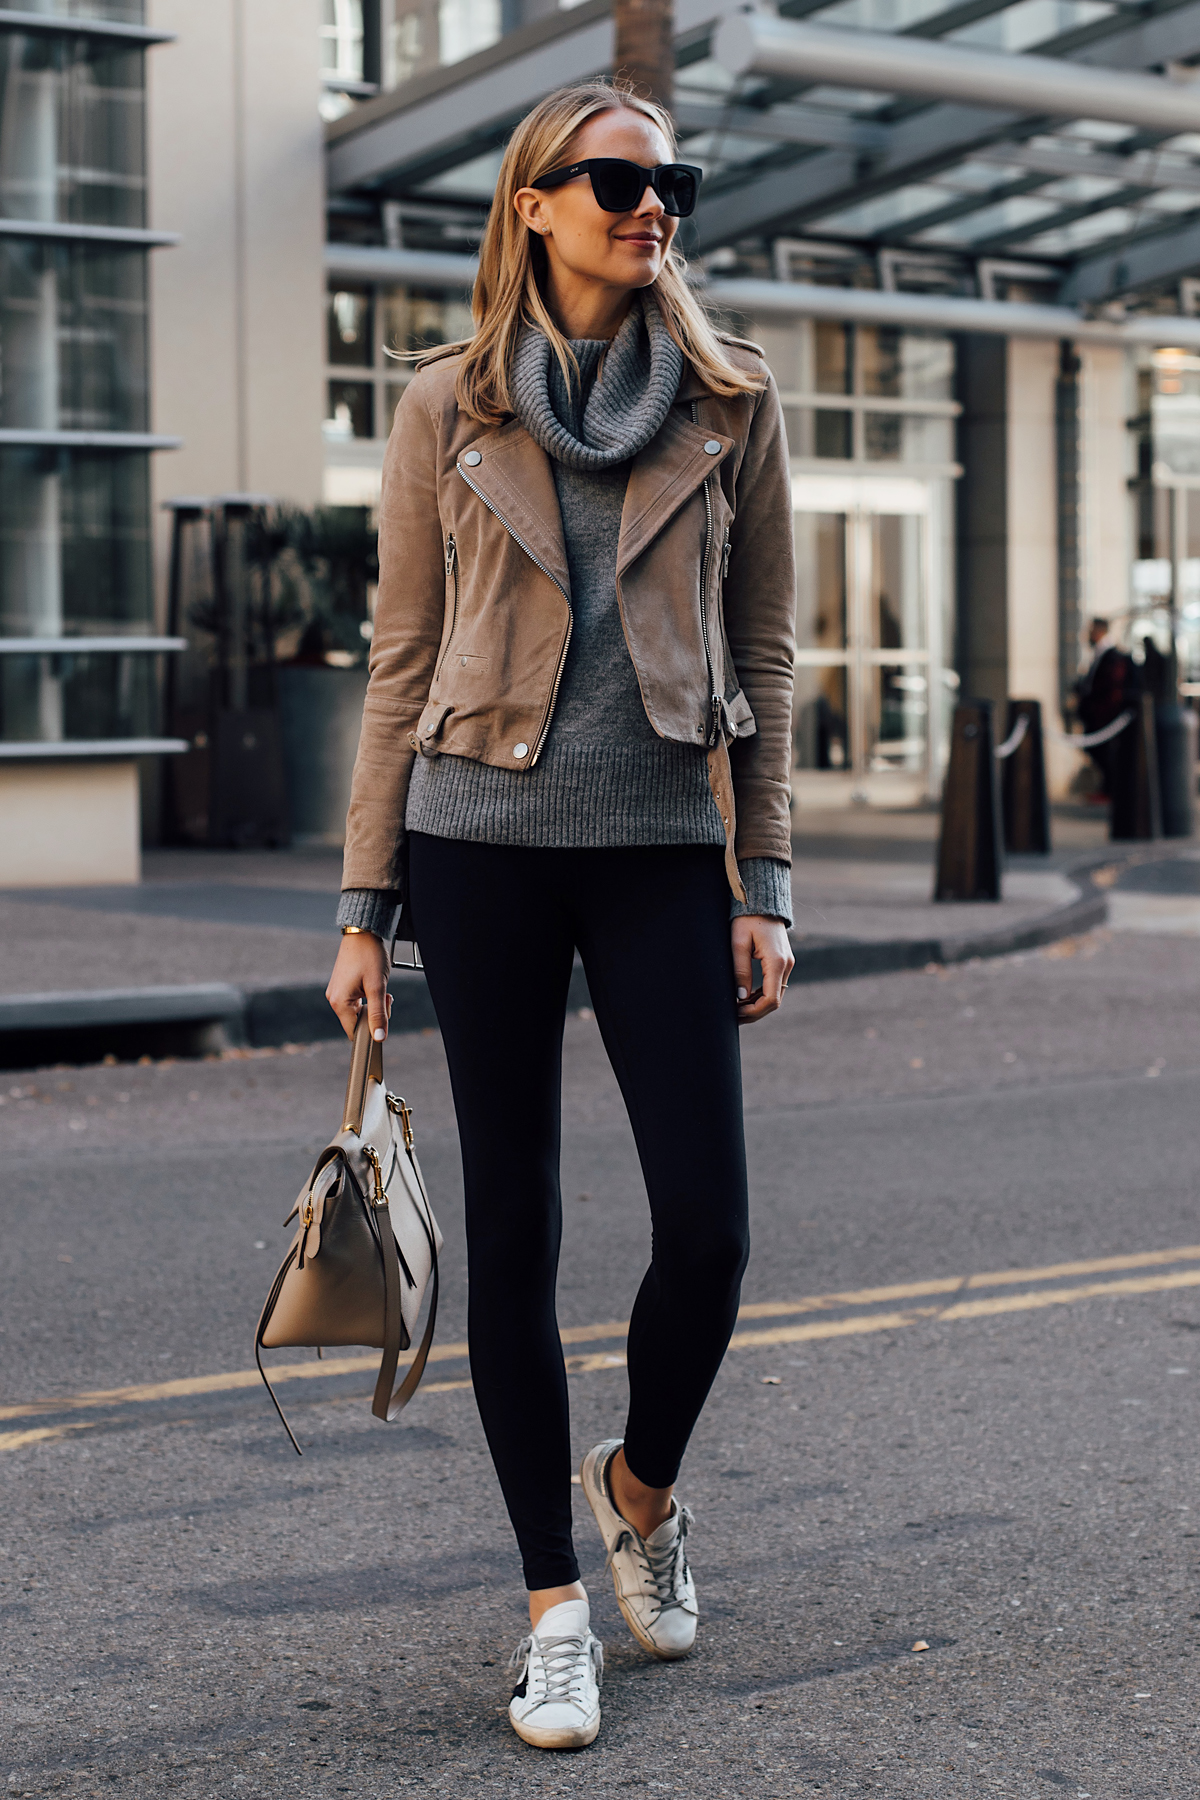 Blonde Woman Wearing Blanknyc Tan Suede Moto Jacket Grey Turtleneck Sweater Black Leggings Golden Goose Sneakers Celine Mini Belt Bag Fashion Jackson San Diego Fashion Blogger Street Style